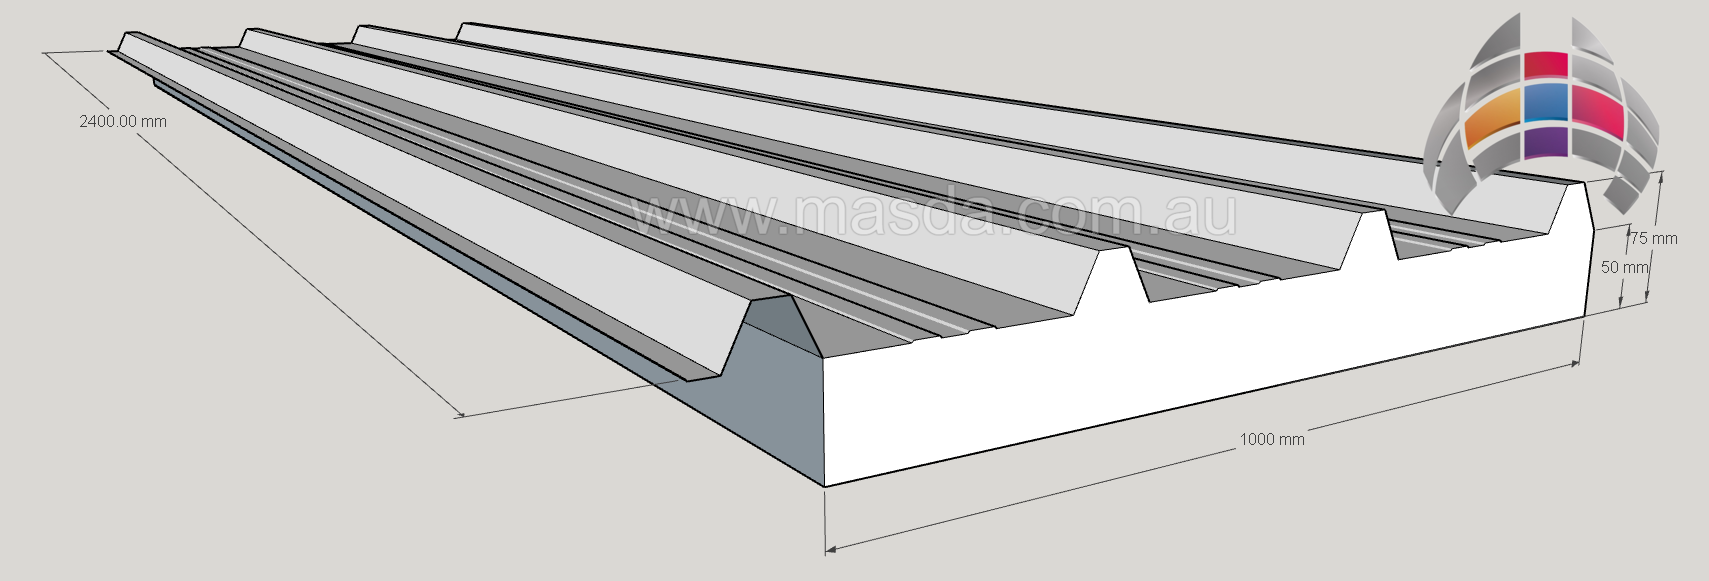 Masda Roof Panel 50mm_2